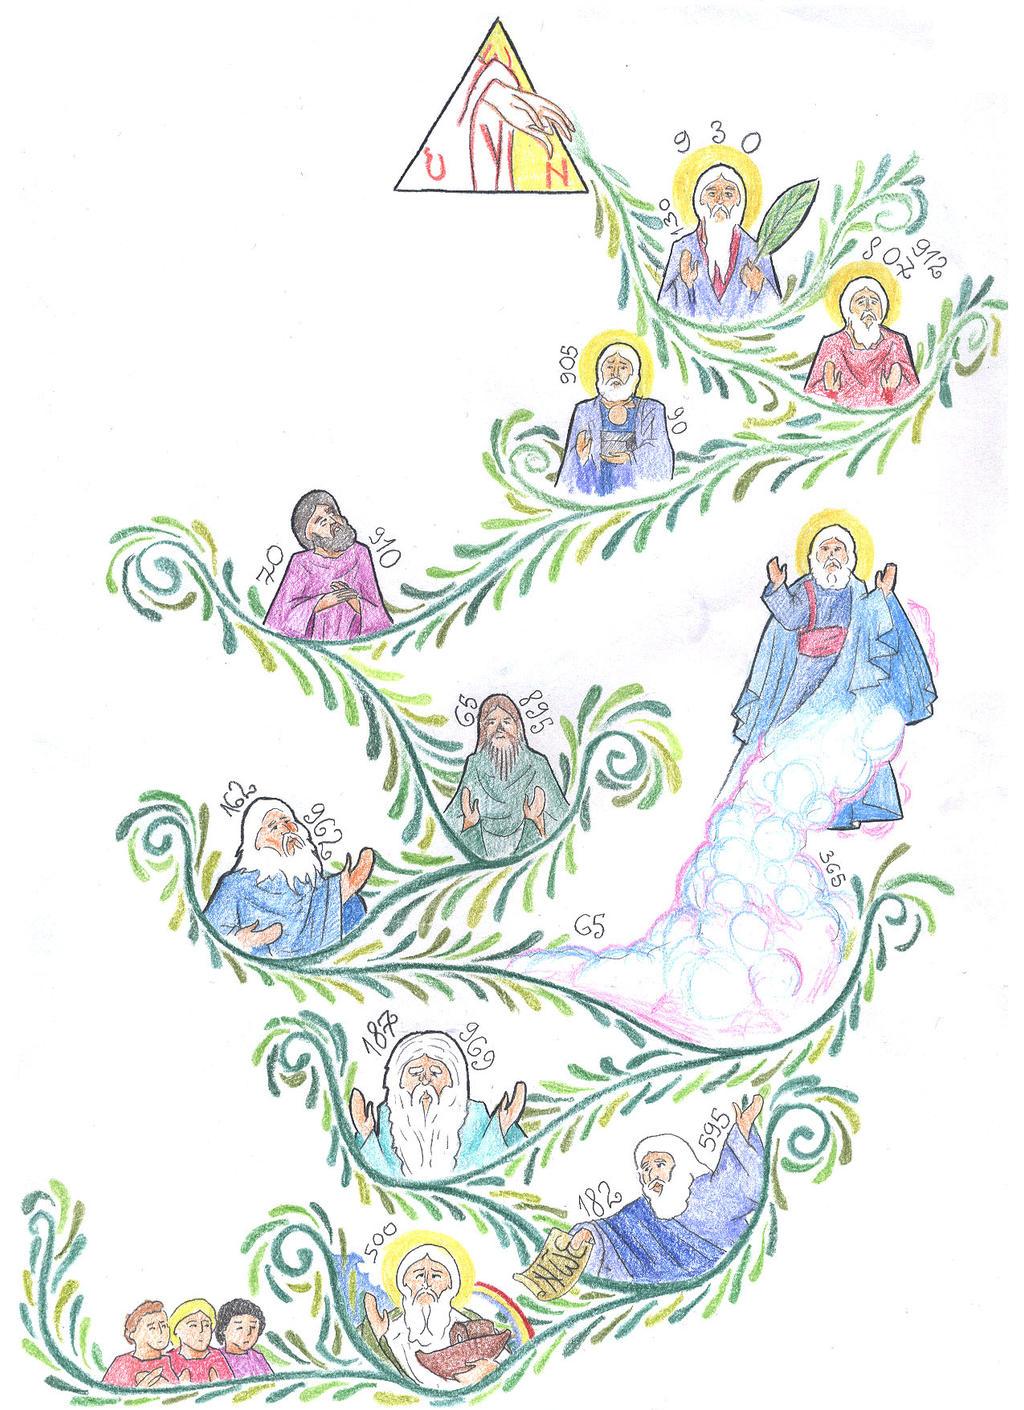 Genesis 5 (From Adam to Noah's Children) by Parastos